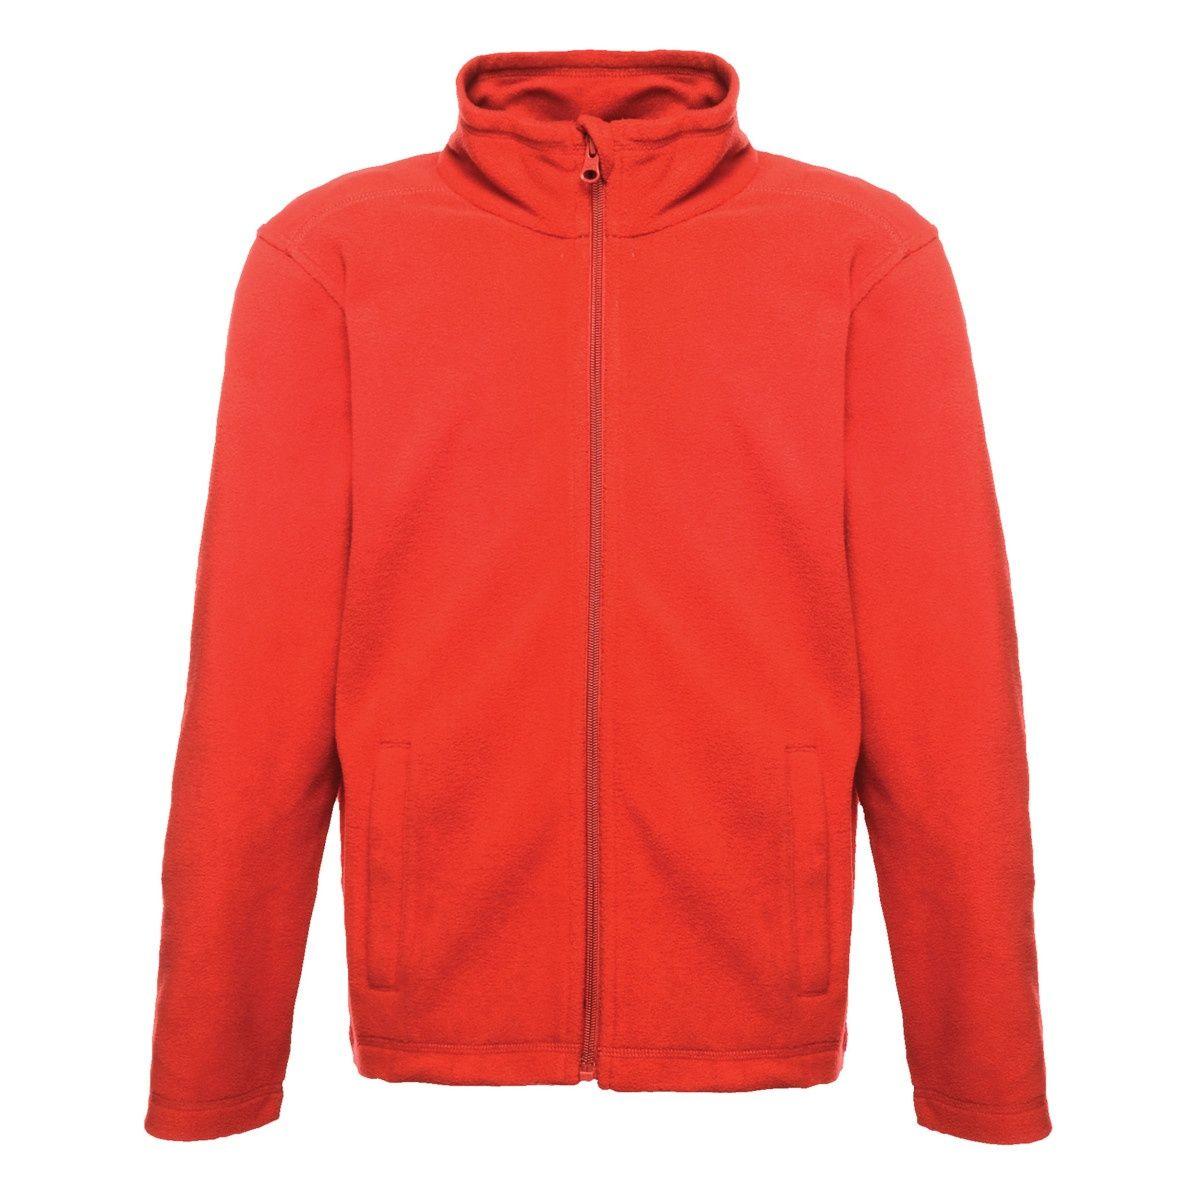 Regatta Childrens/Kids Brigade II Fleece (Red)